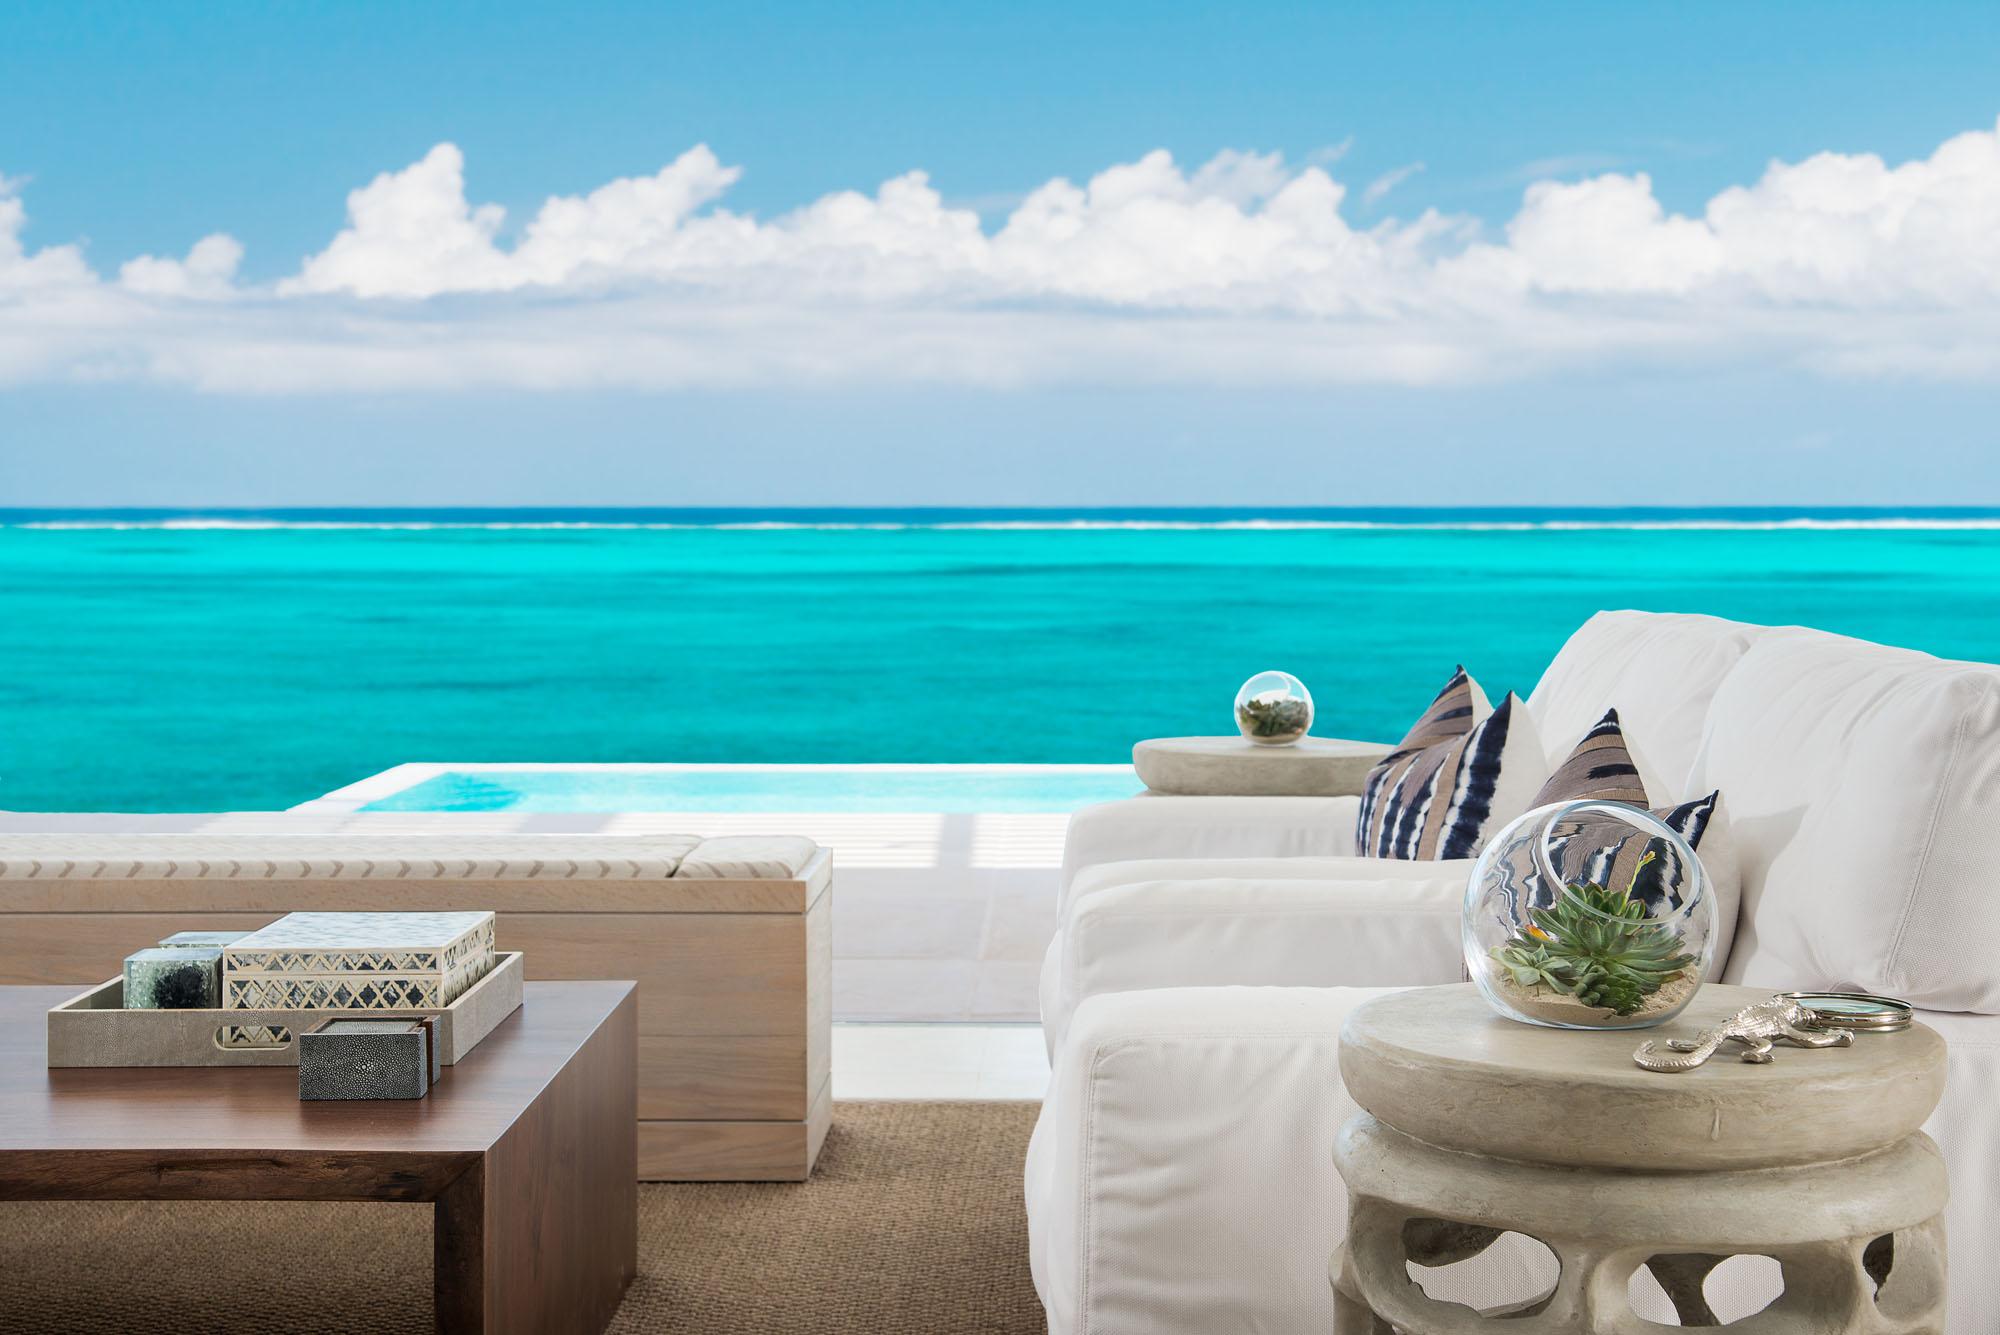 The luxury Caribbean beach villas feature beautiful en-suite bathrooms for all bedrooms.